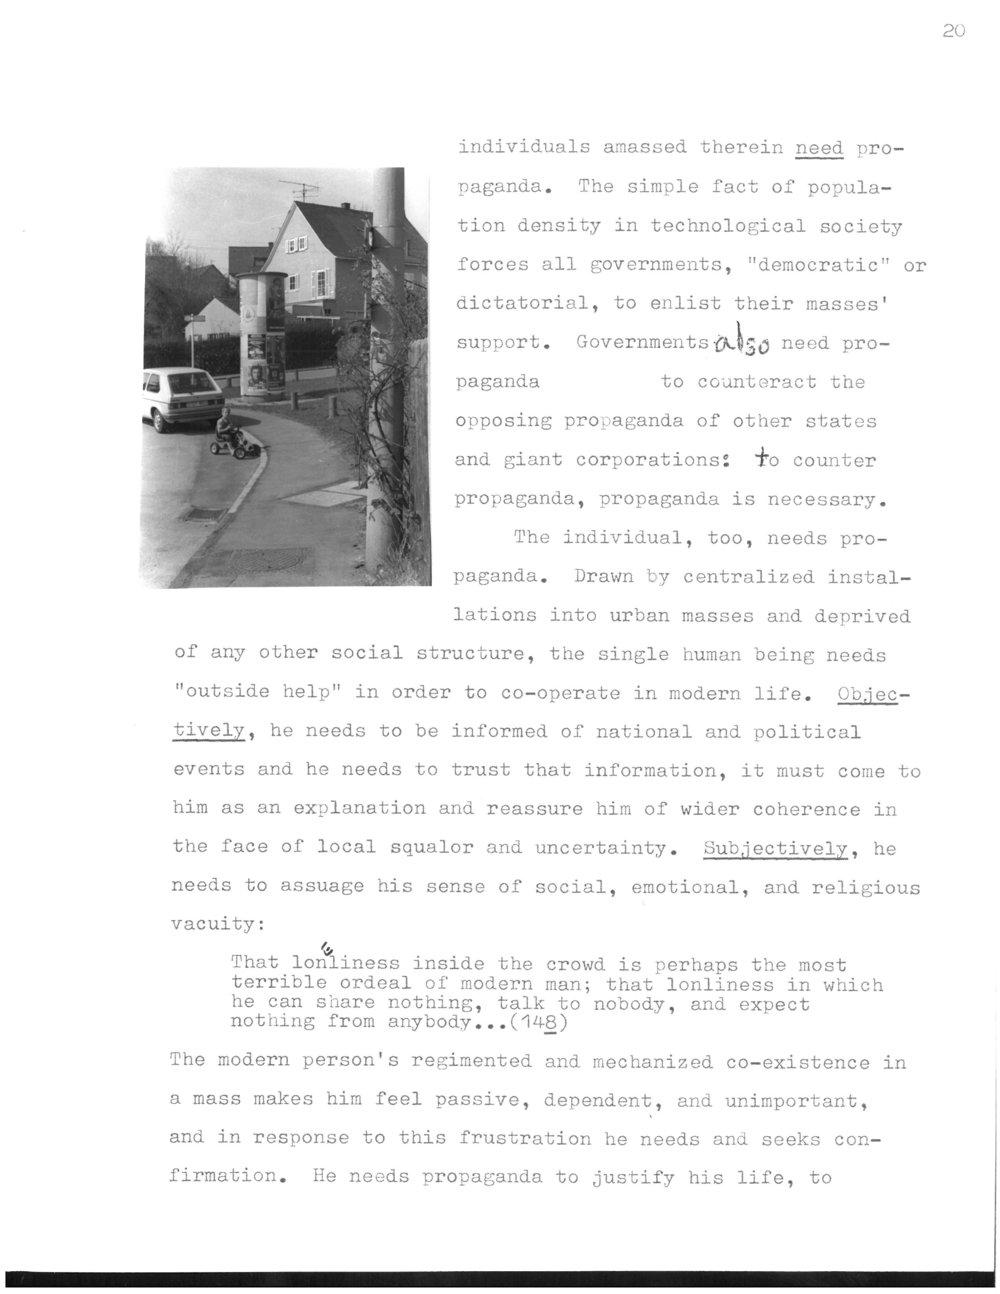 Propaganda_Page_22.jpg